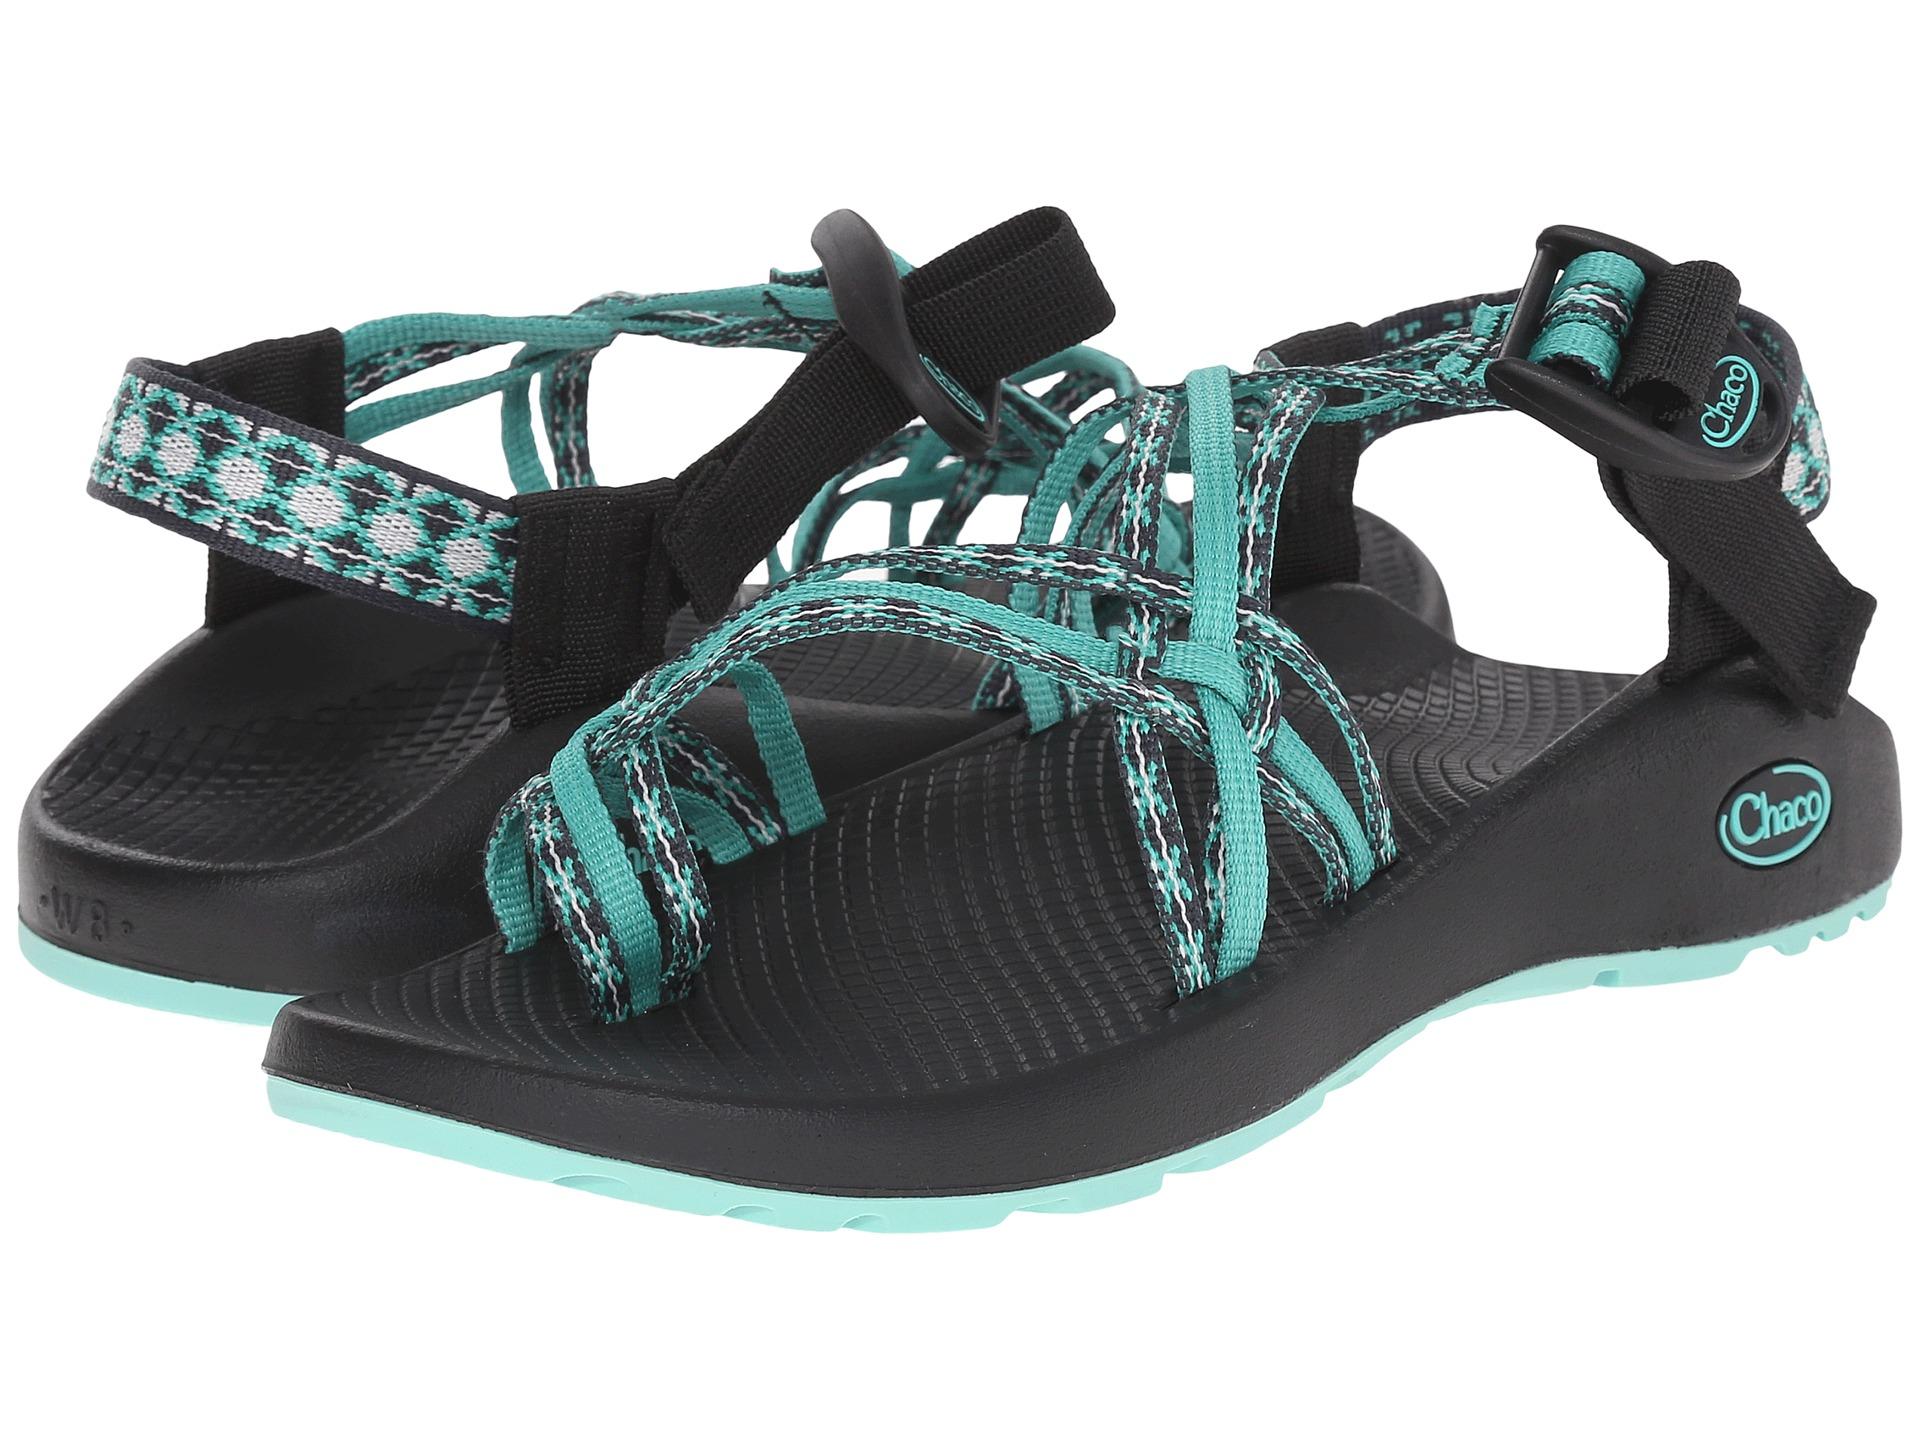 Womens sandals chaco - Womens Sandals Chaco 31